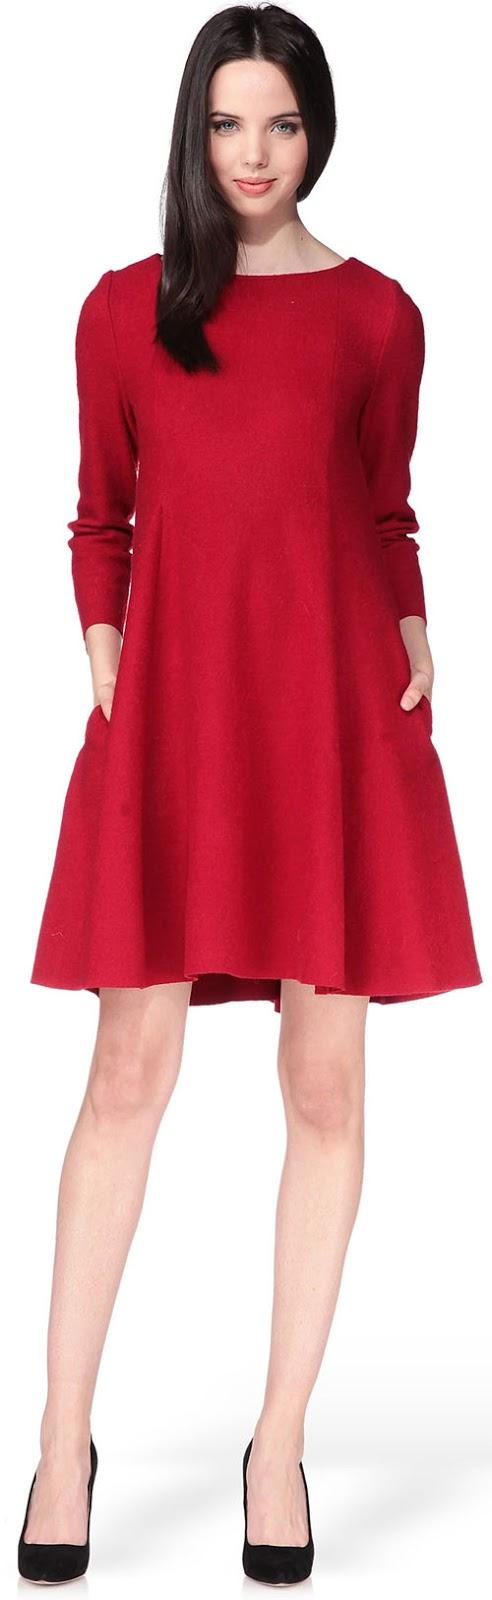 Robe courte rouge en laine Cacharel